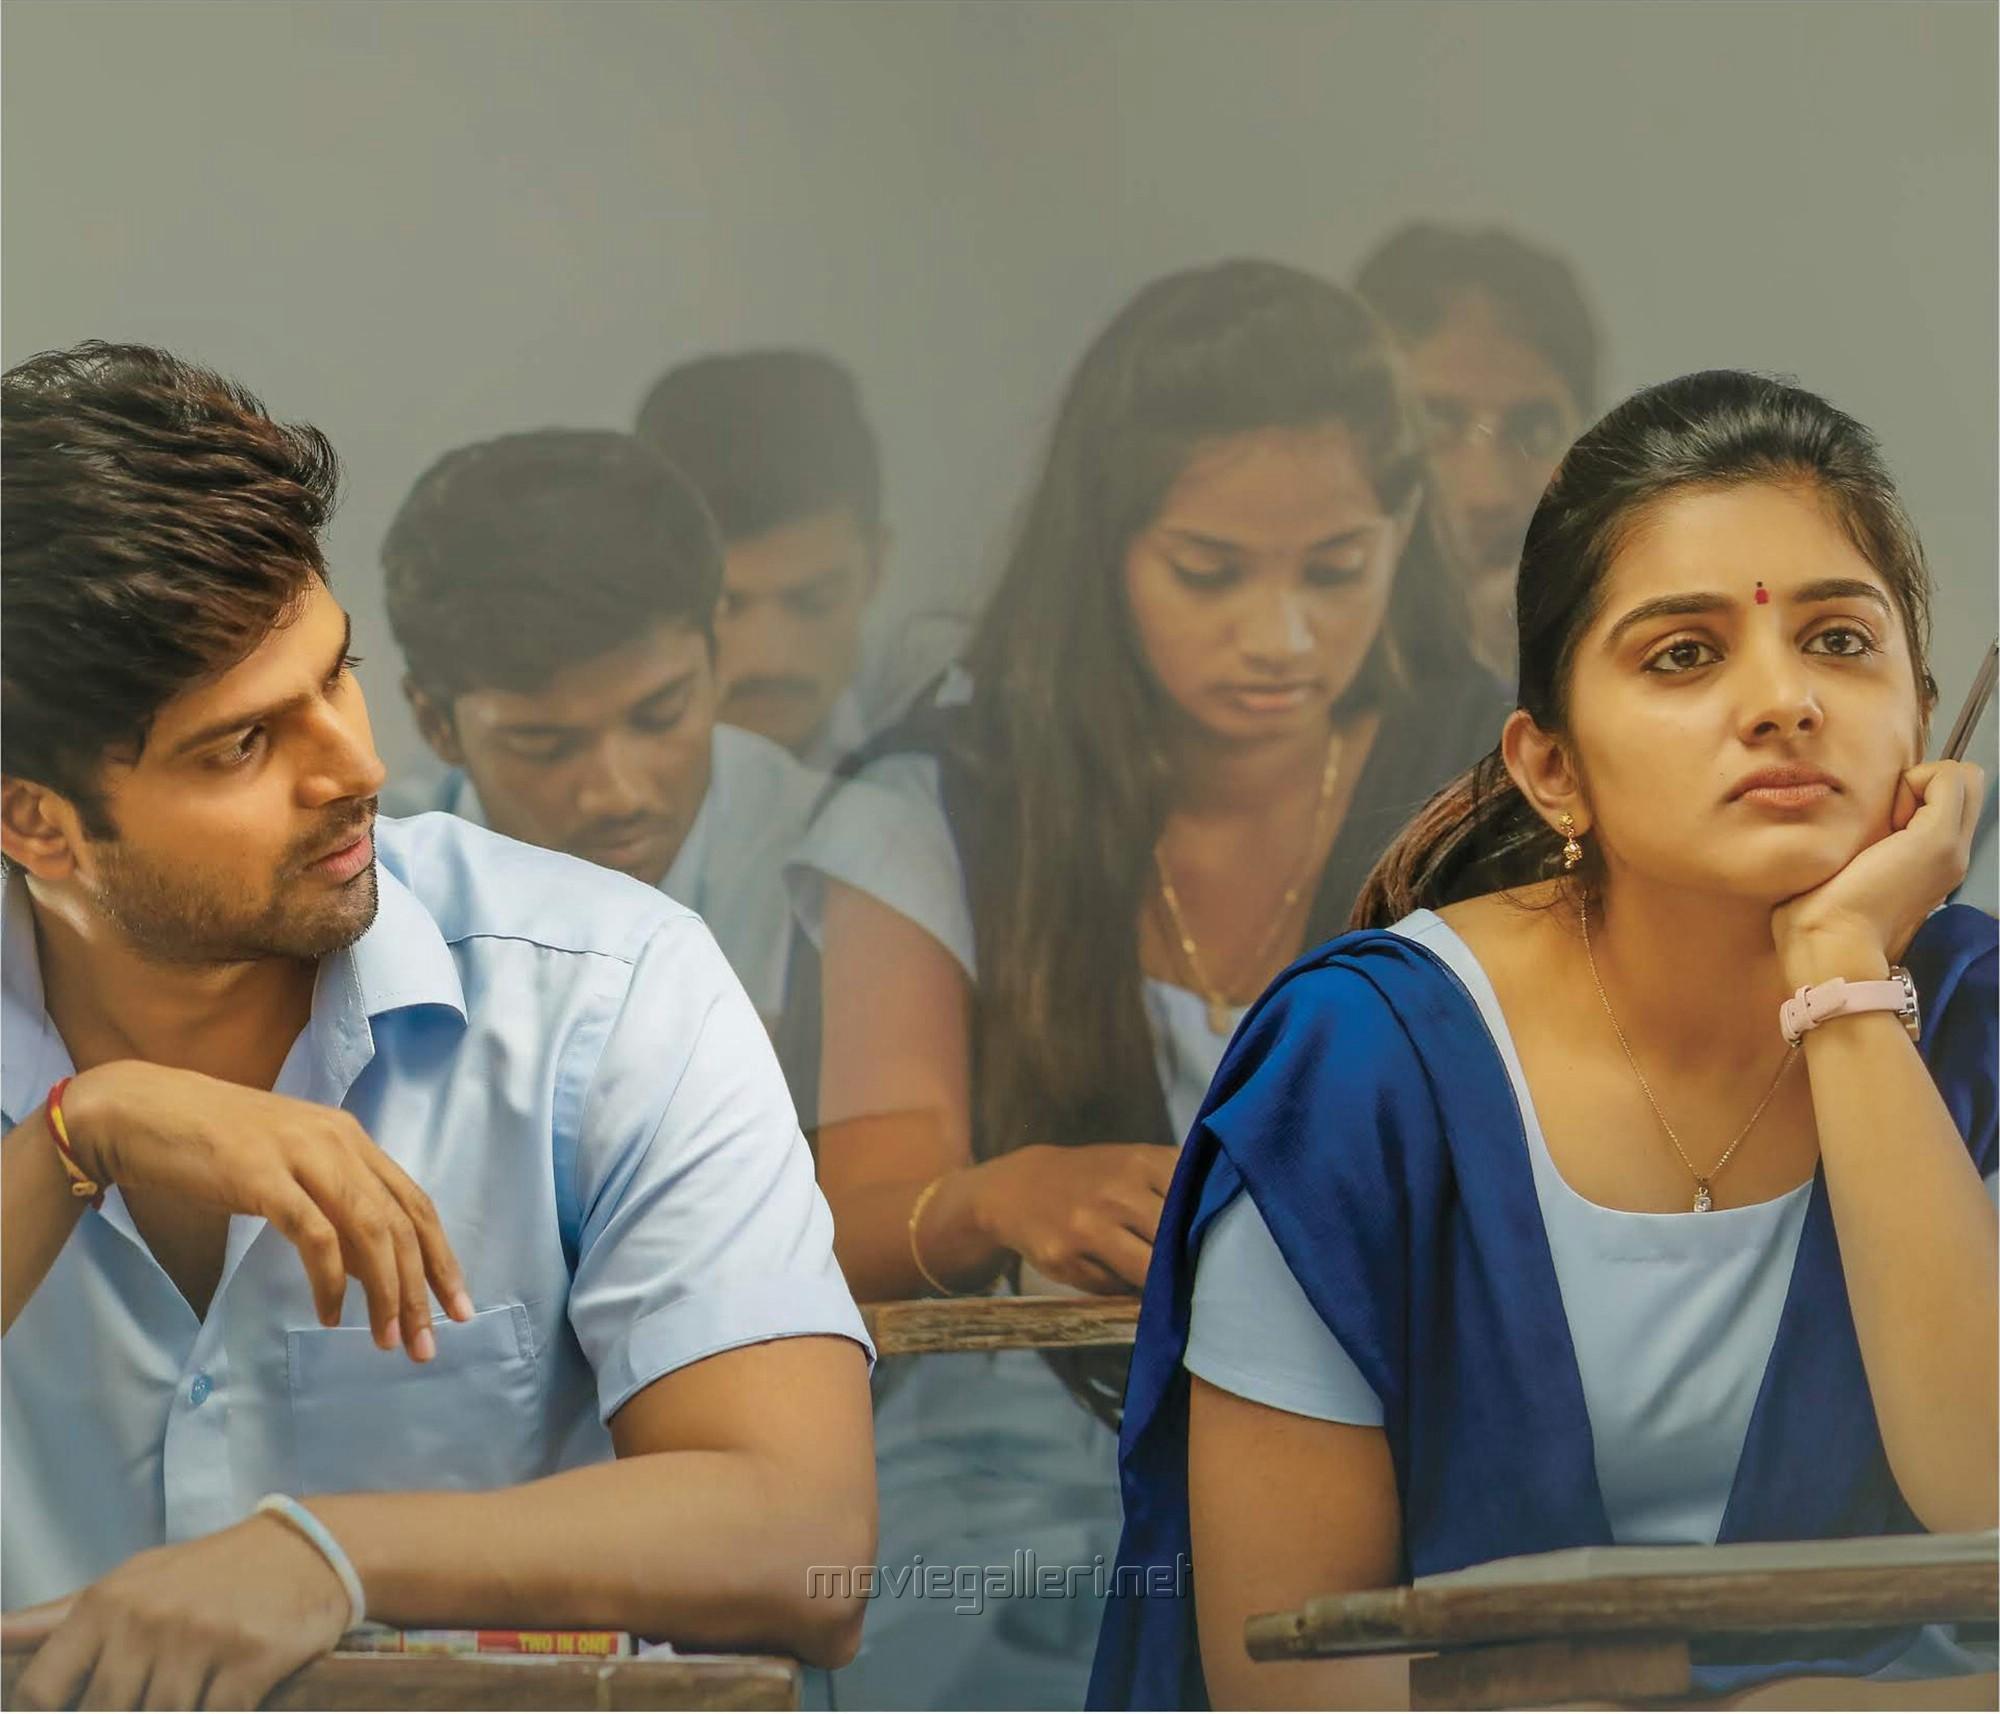 Sree Vishnu, Nivetha Thomas 'Brochevarevarura' Movie Release On June 28th